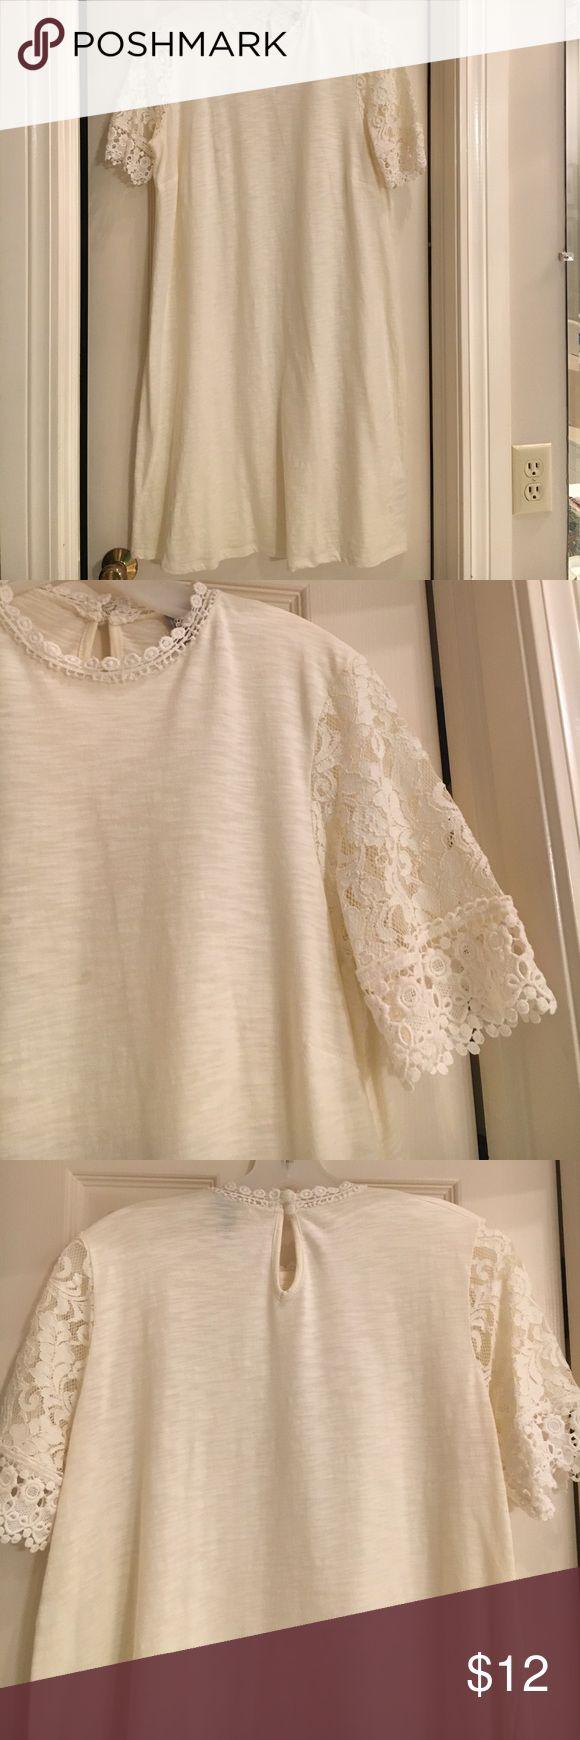 25 unique crochet maternity dresses ideas on pinterest pregnacy lace sleeve maternity dress ombrellifo Image collections